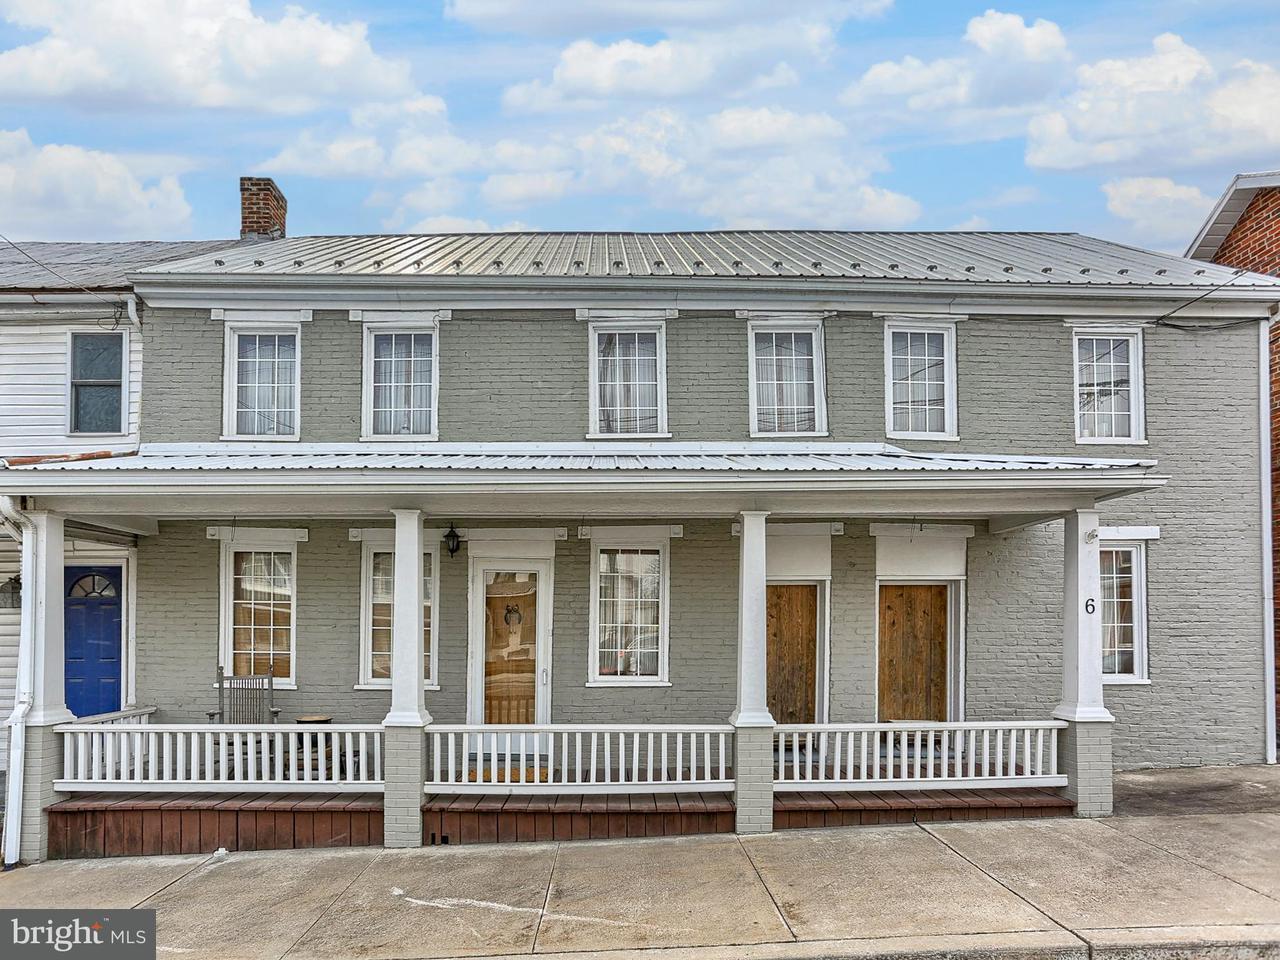 Single Family for Sale at 6 Main St E Newburg, Pennsylvania 17240 United States